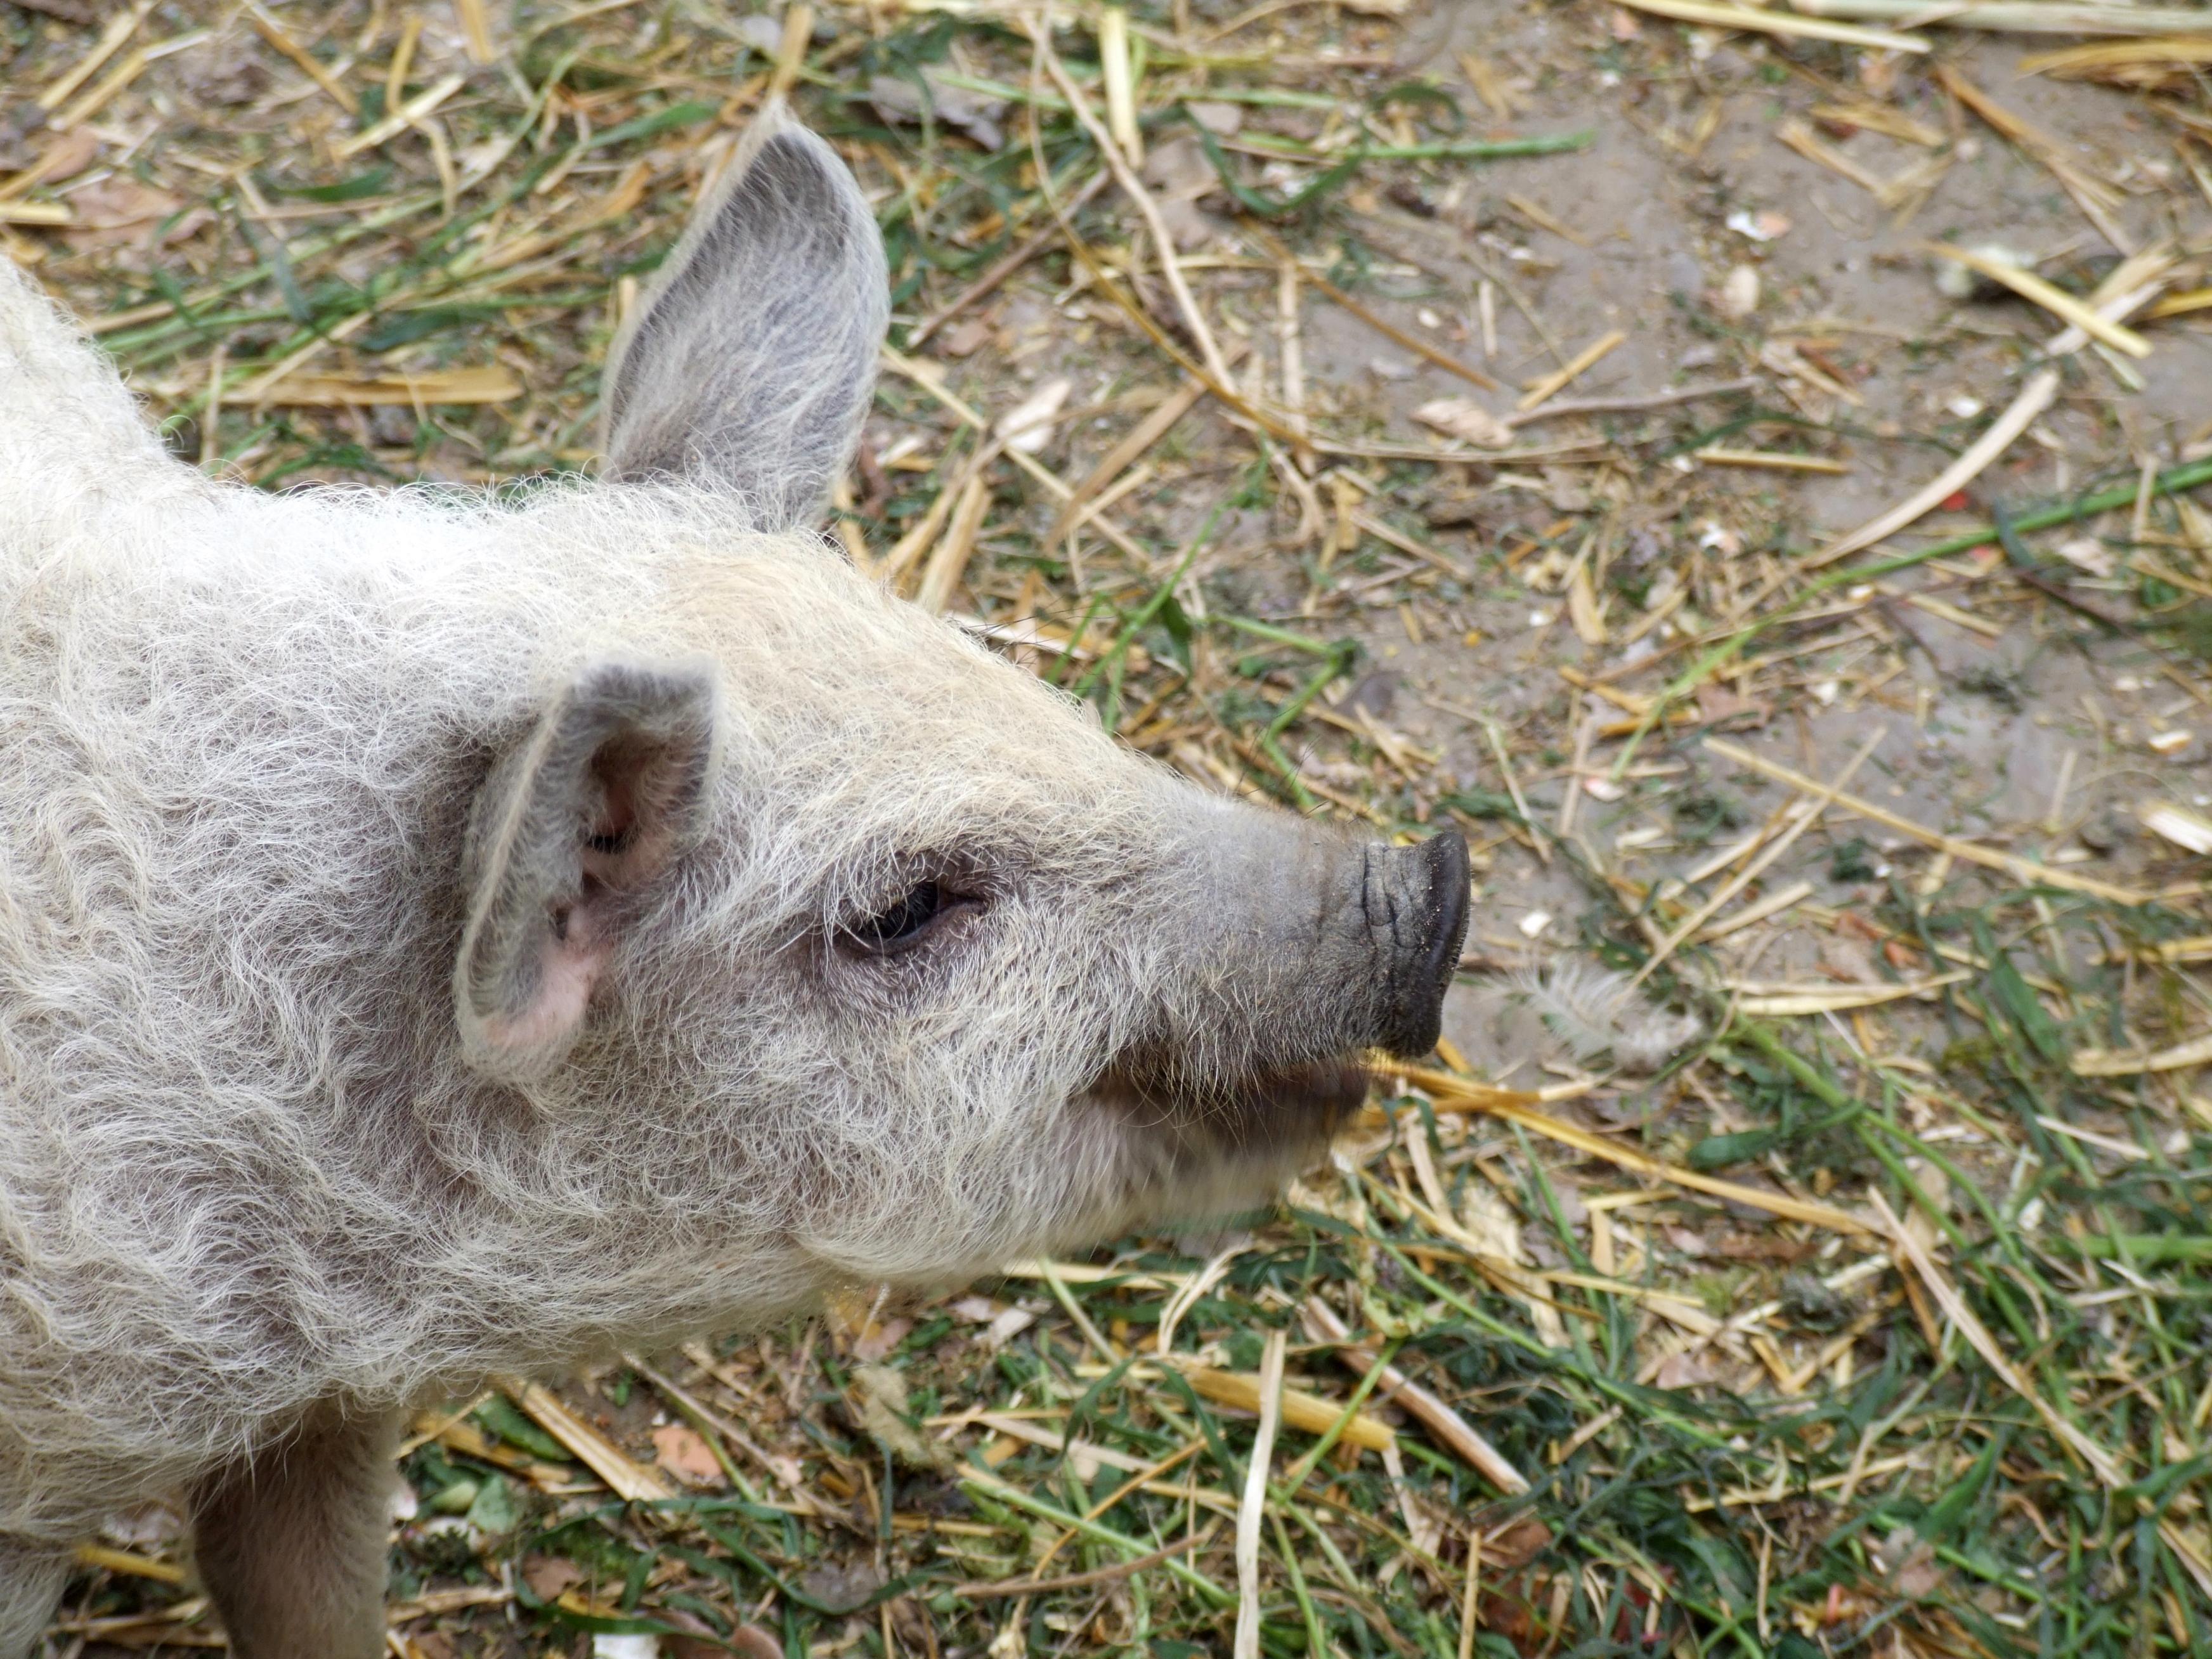 Fluffy Piggie